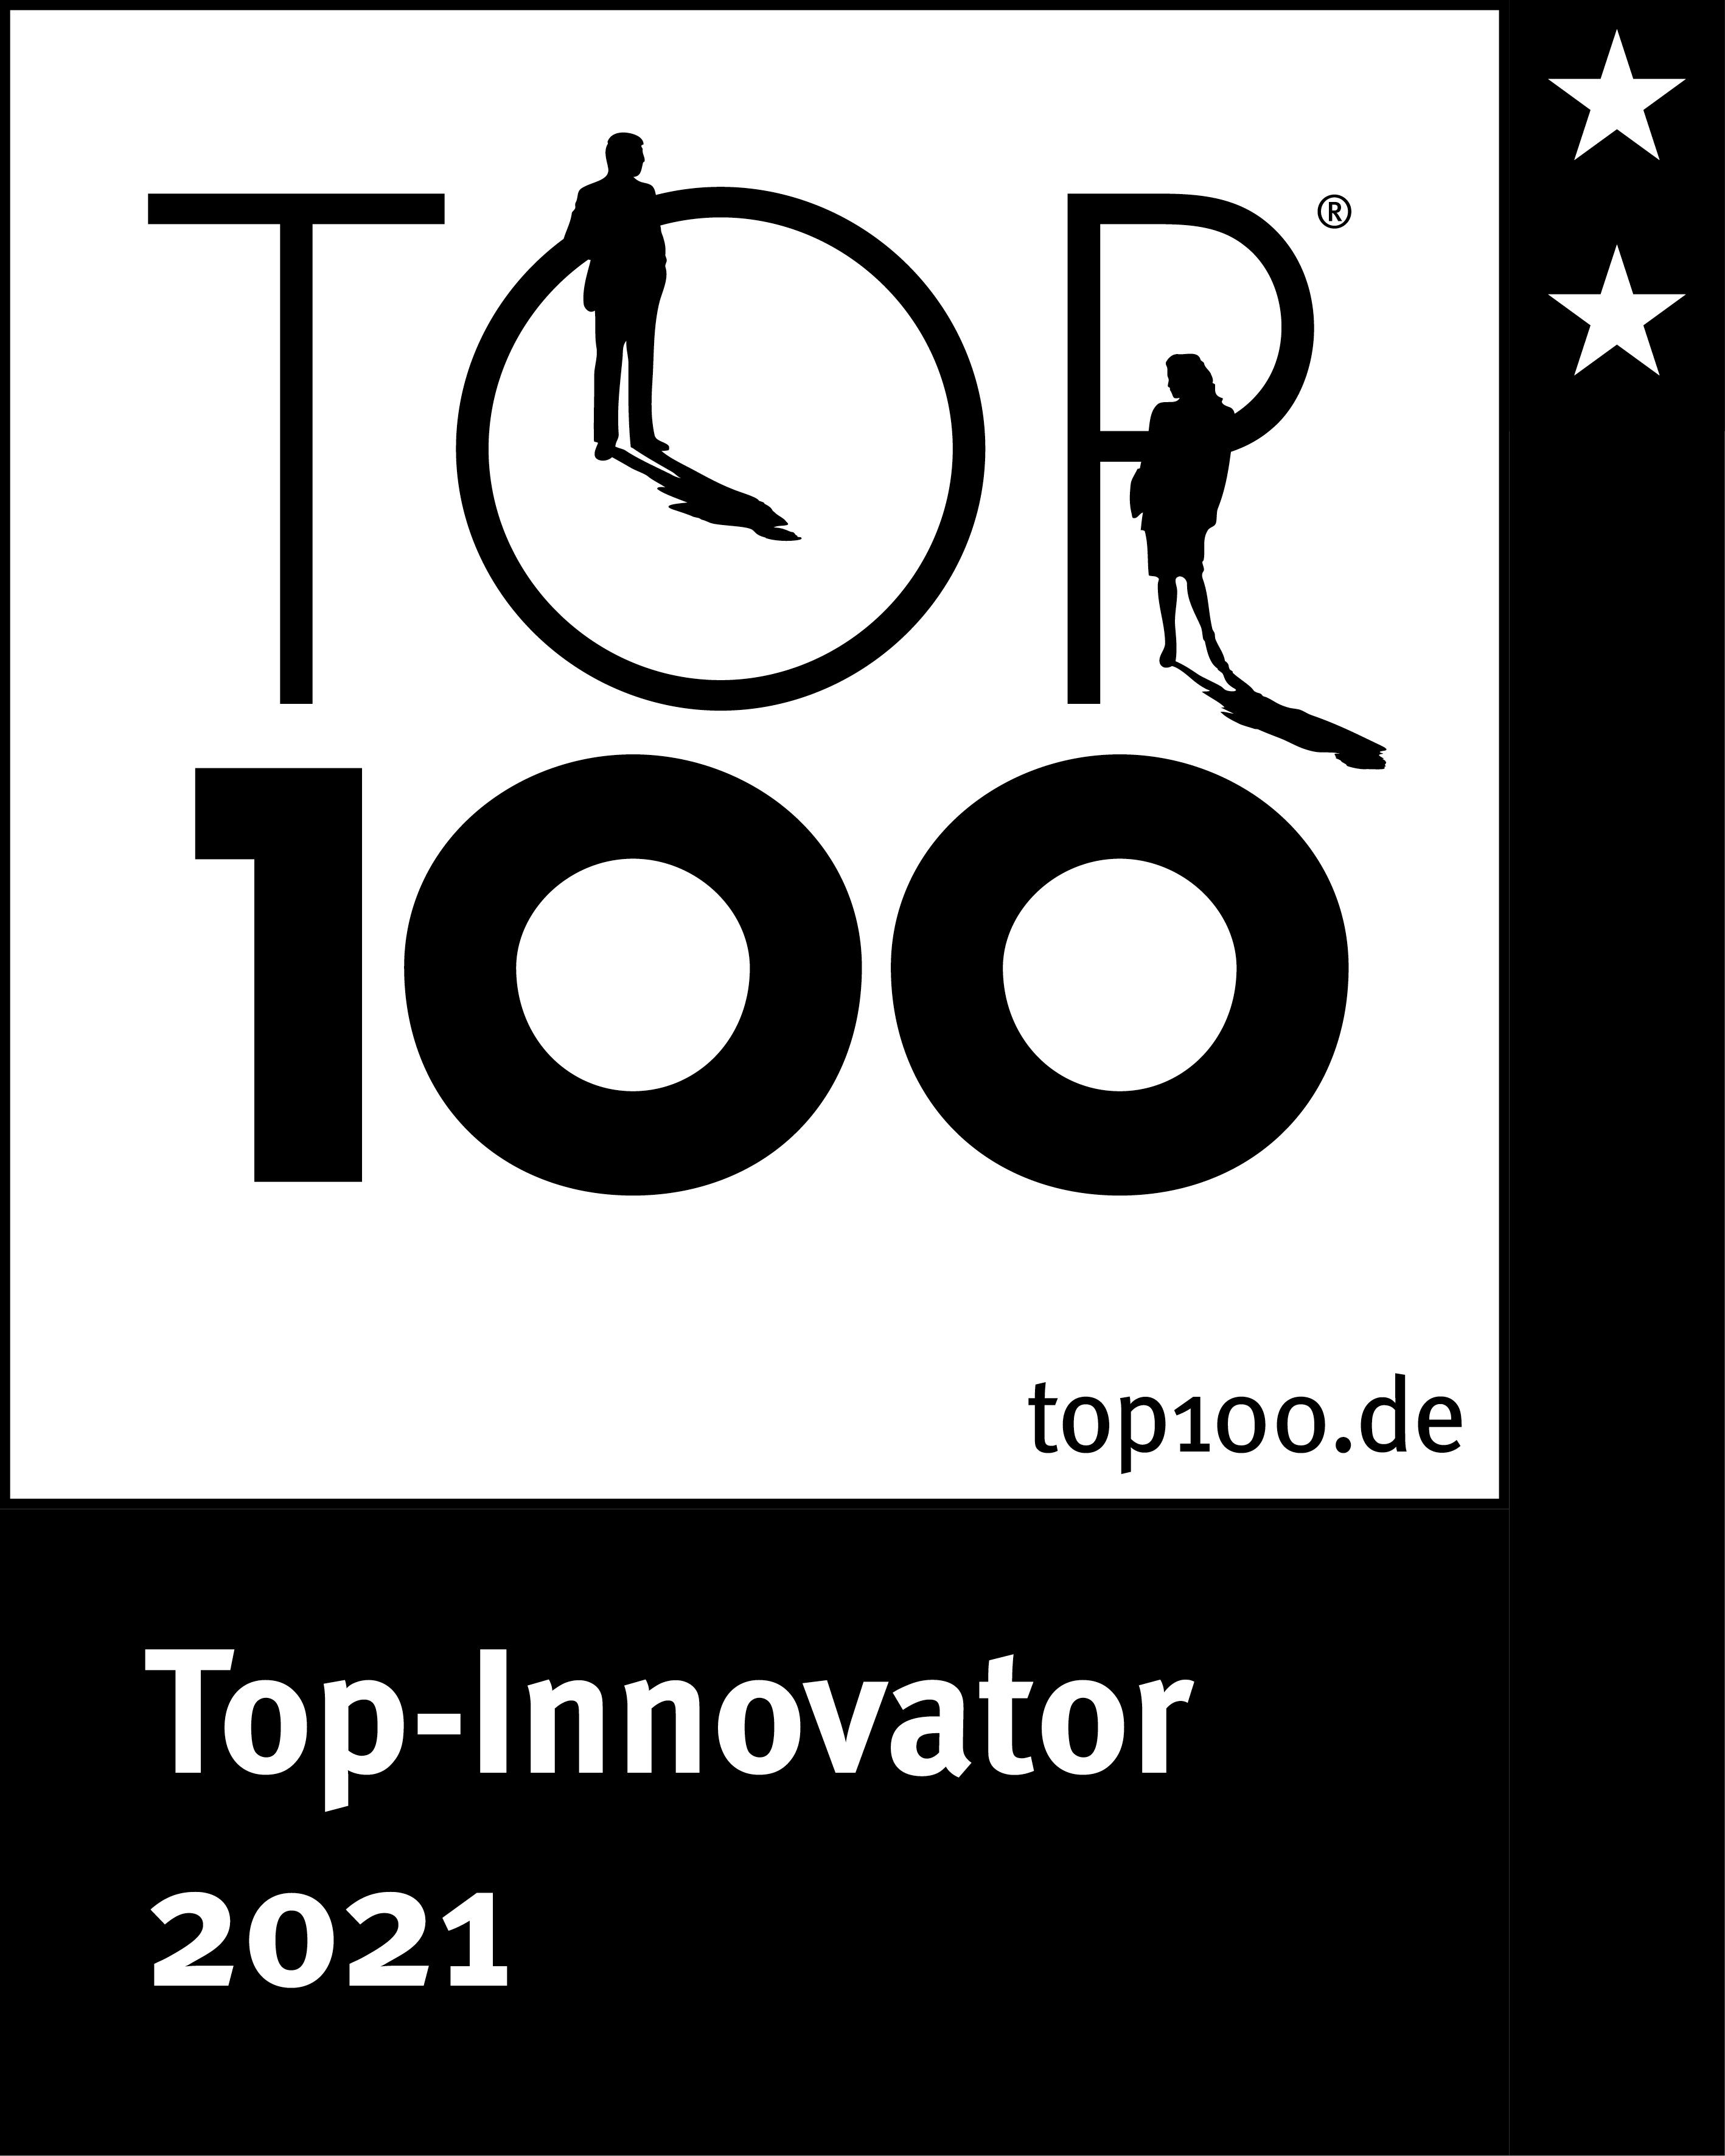 Top-Innovator 2018